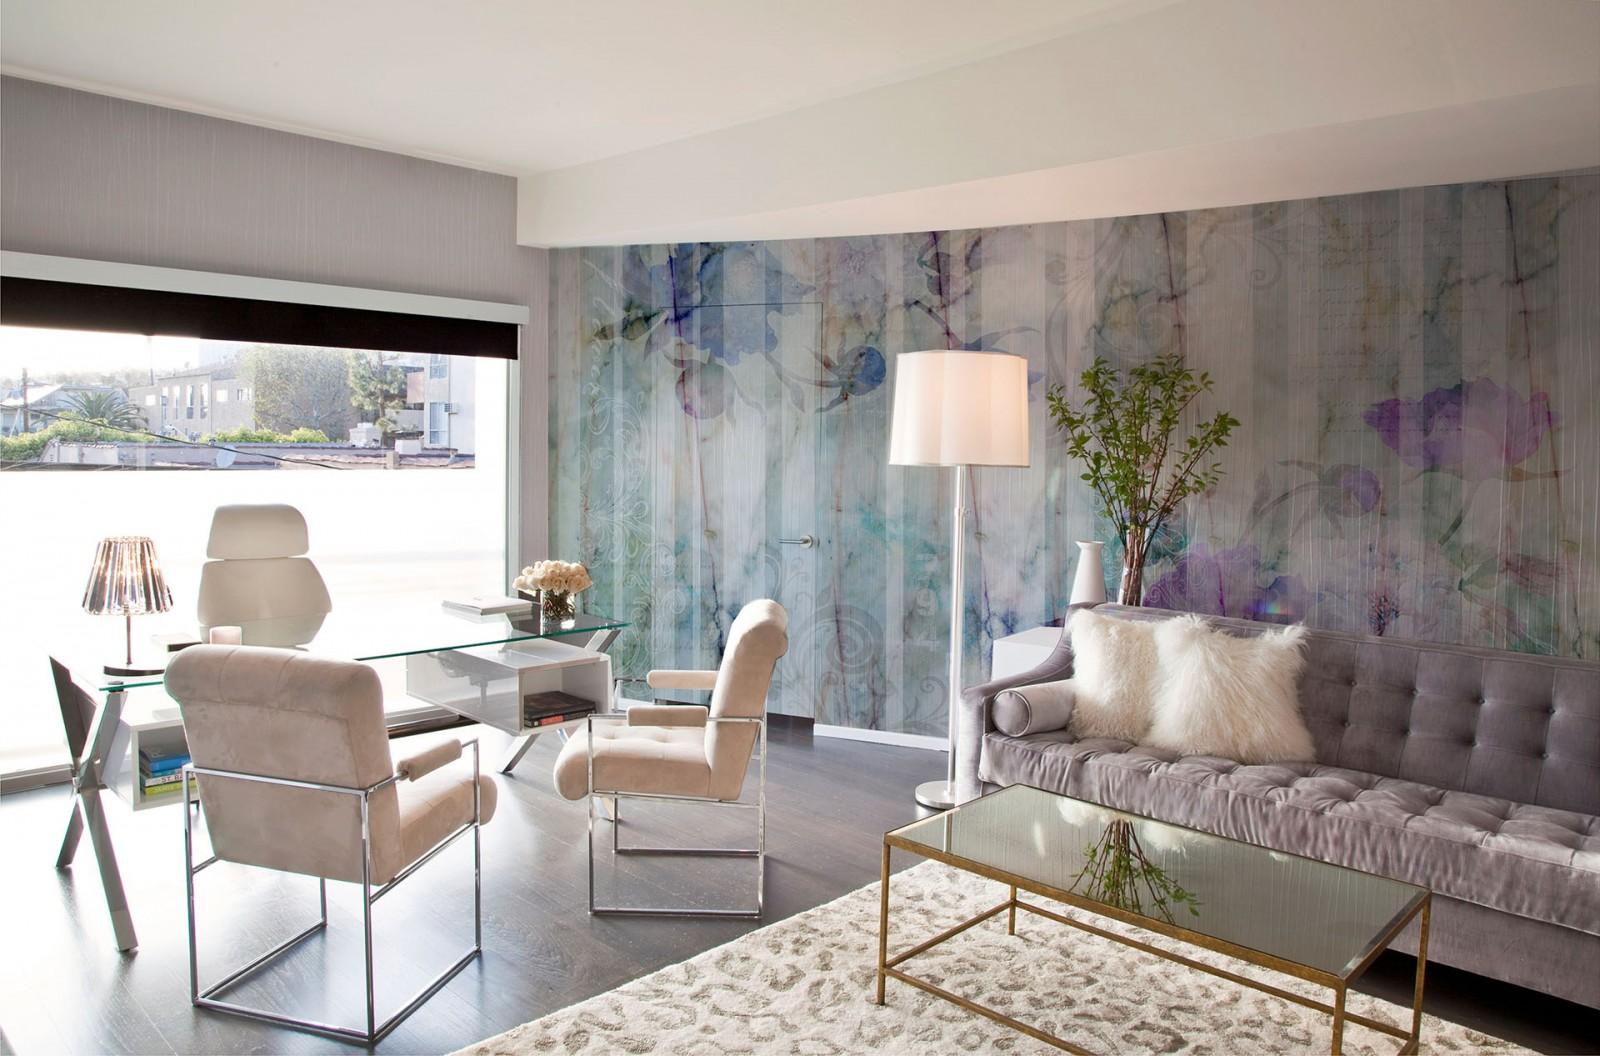 Tappezzeria flower cp 43 demart interior decoration for Tappezzeria adesiva